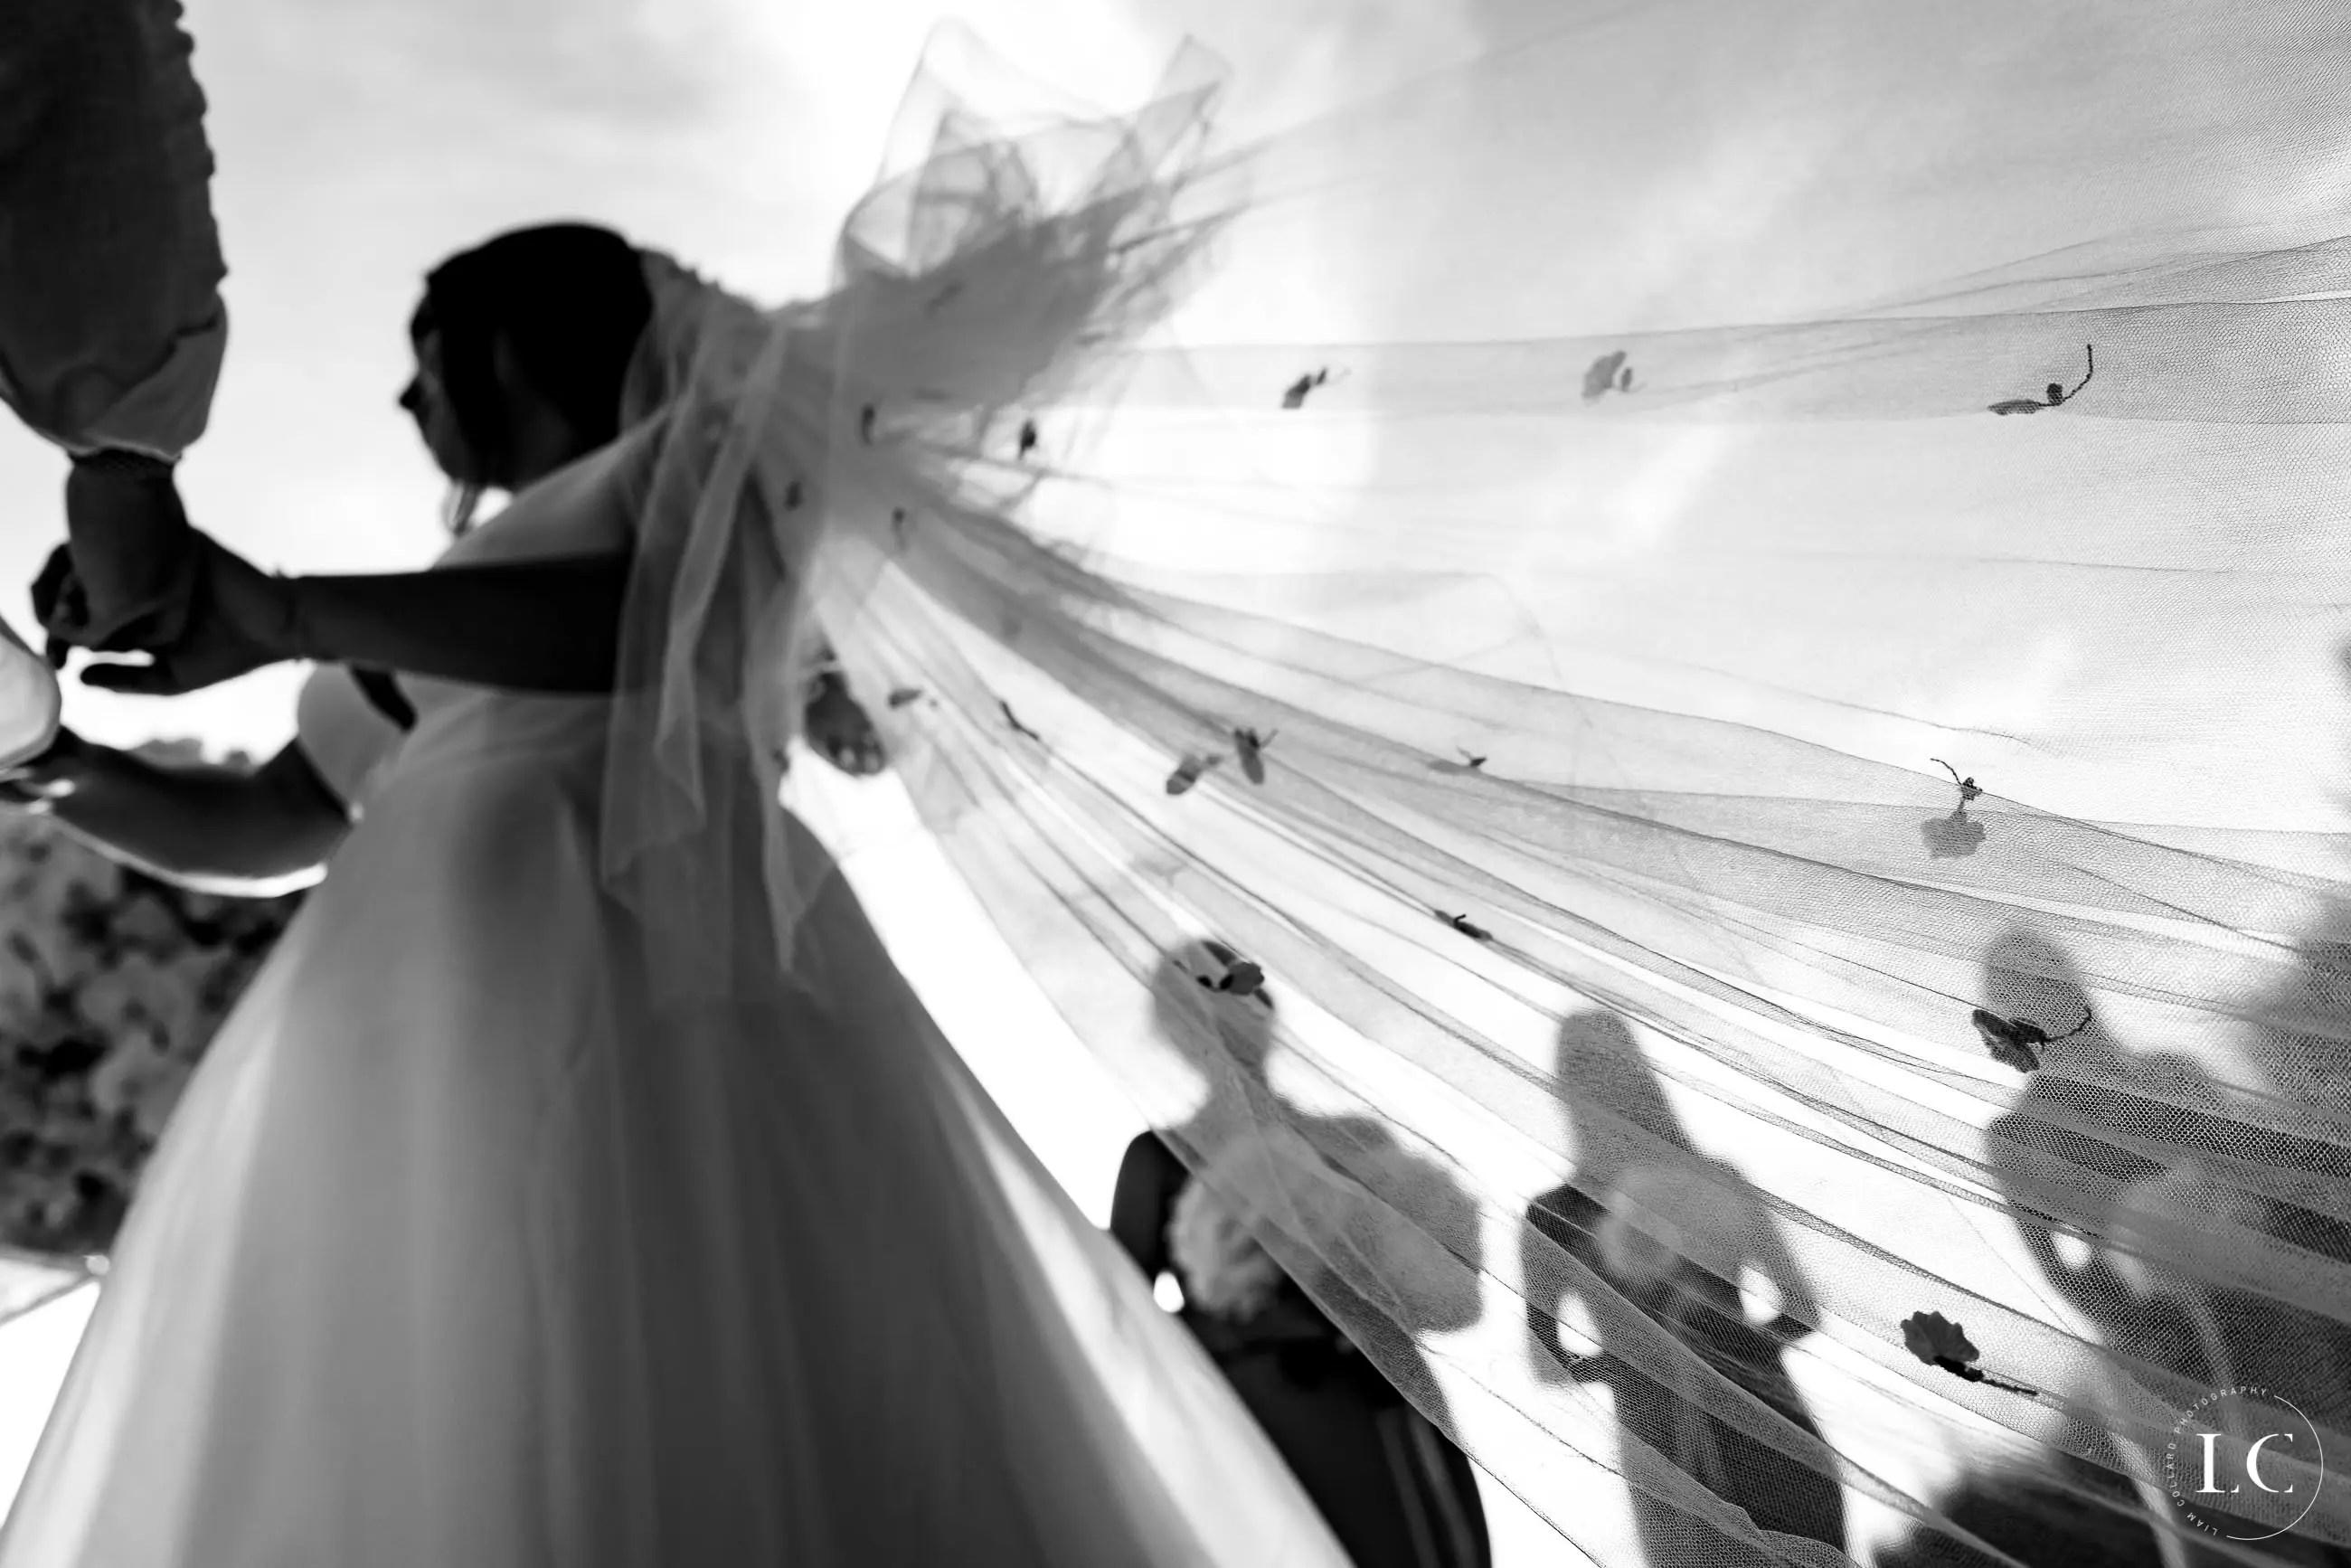 Bride's veil in the wind